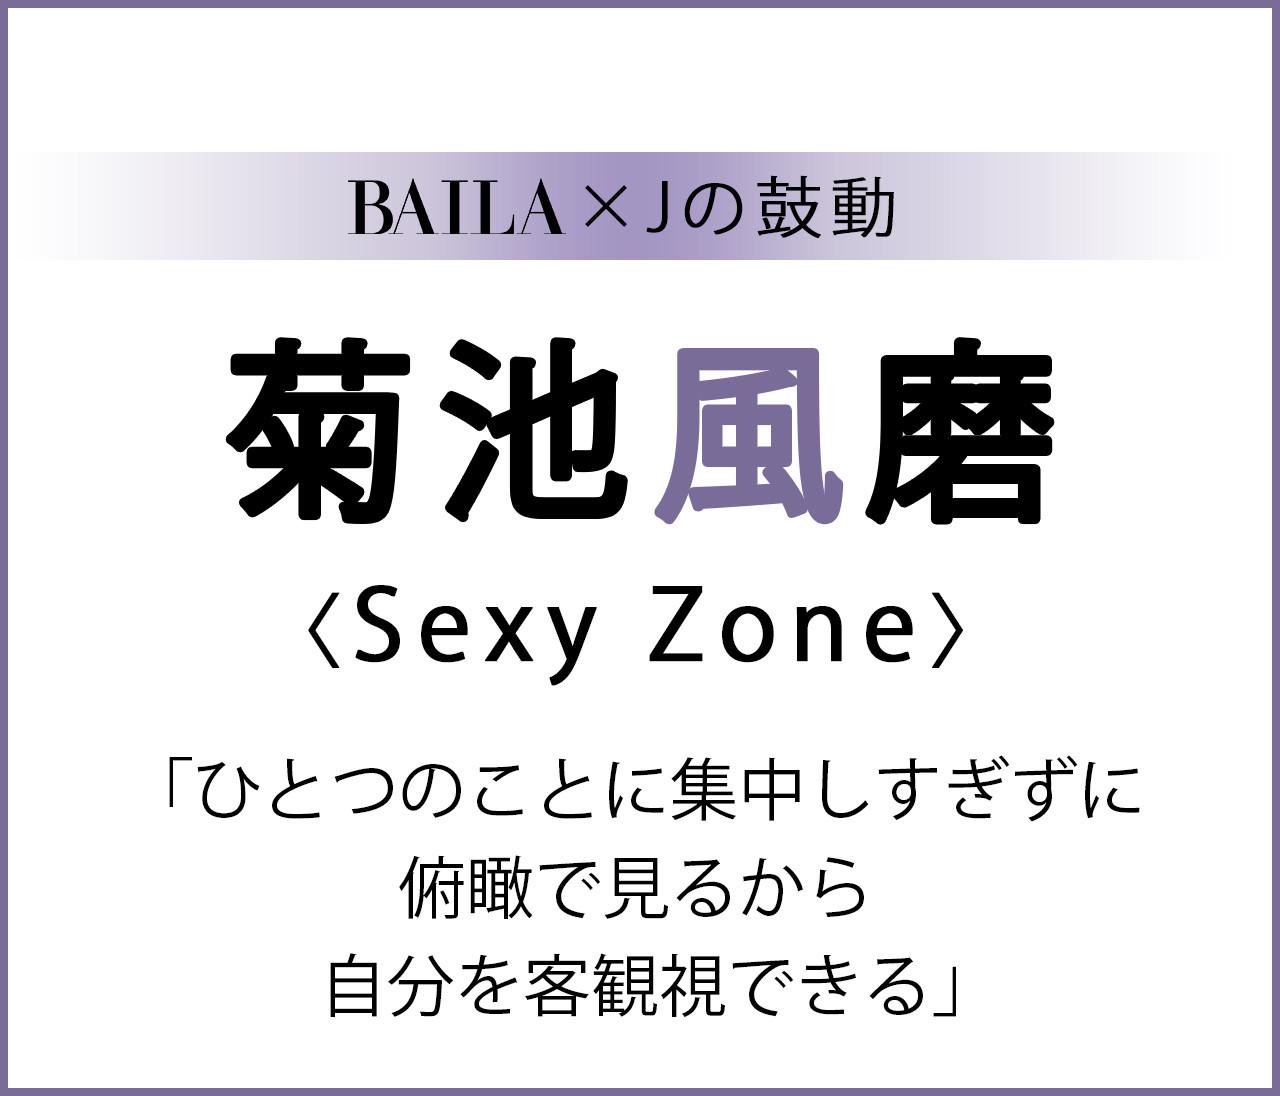 【 #SexyZone #菊池風磨 】Sexy Zone 菊池風磨スペシャルインタビュー<前編>【BAILA × Jの鼓動】